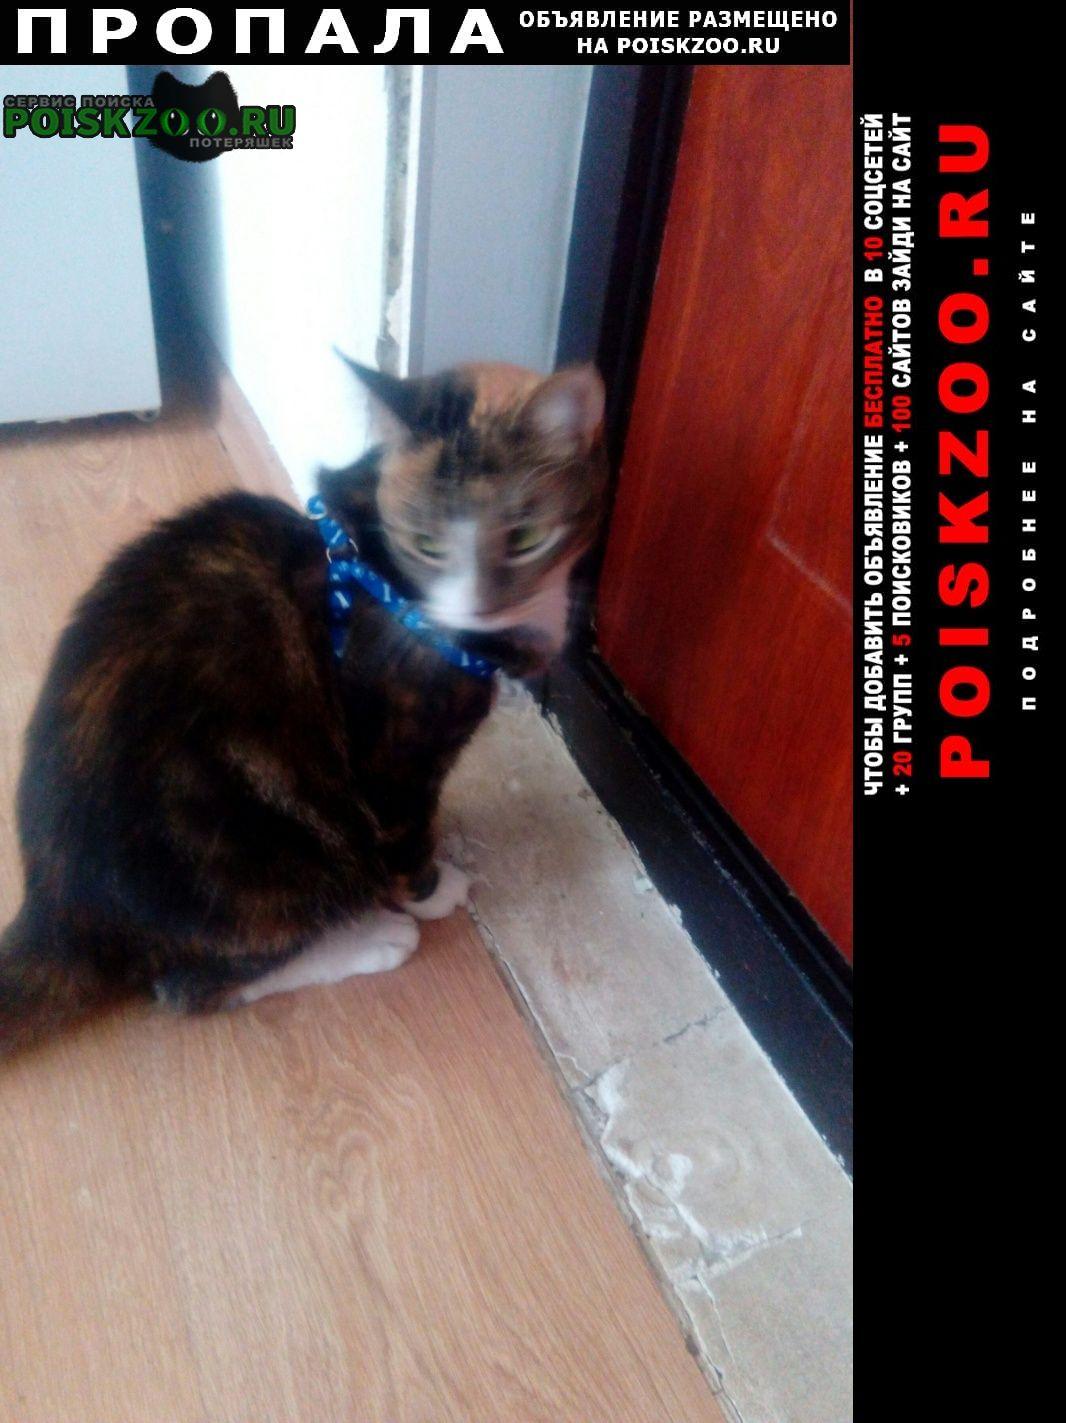 Пропала кошка Великий Новгород (Новгород)